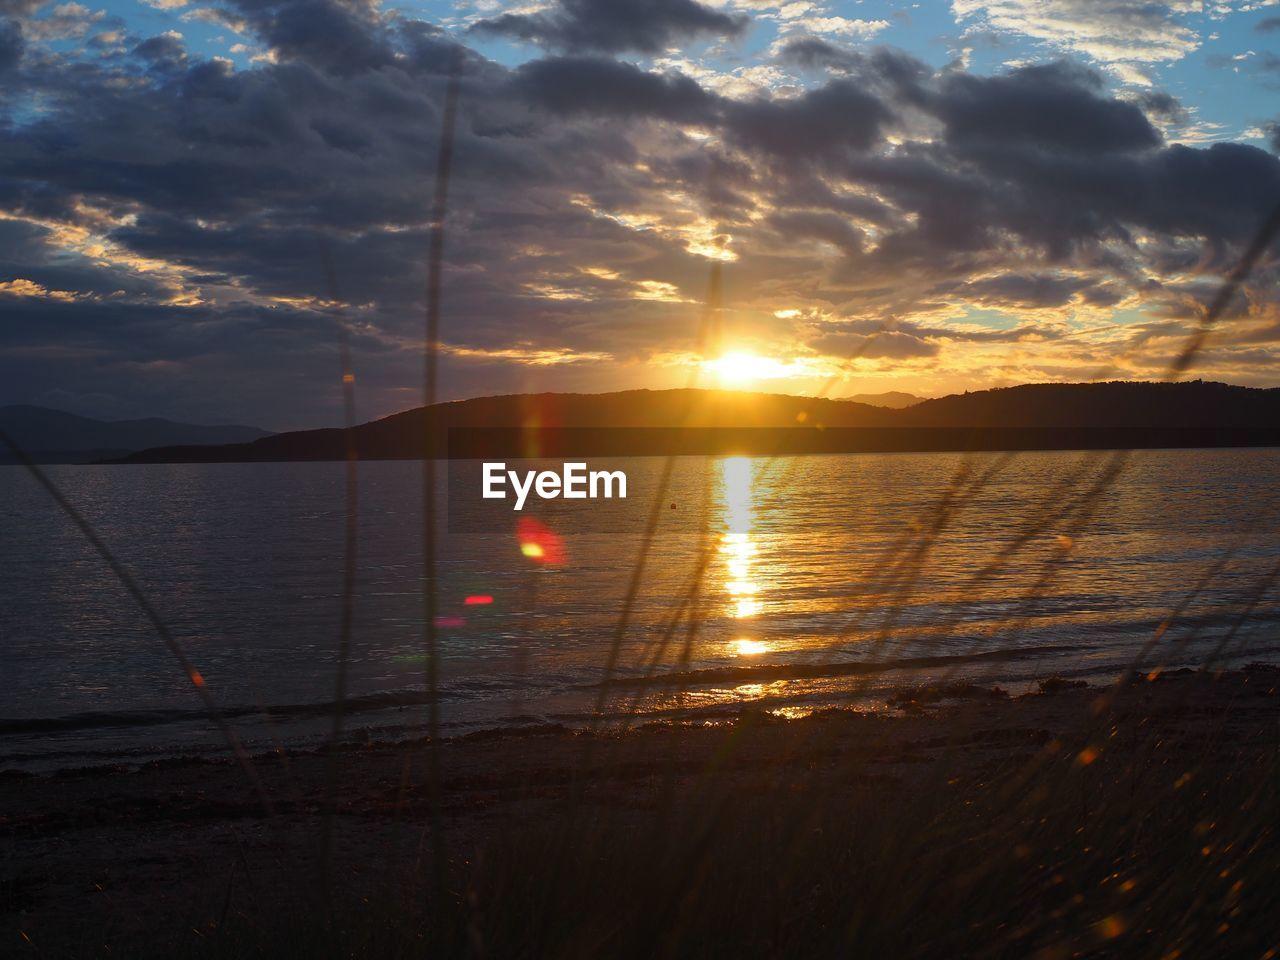 VIEW OF CALM LAKE AT SUNSET